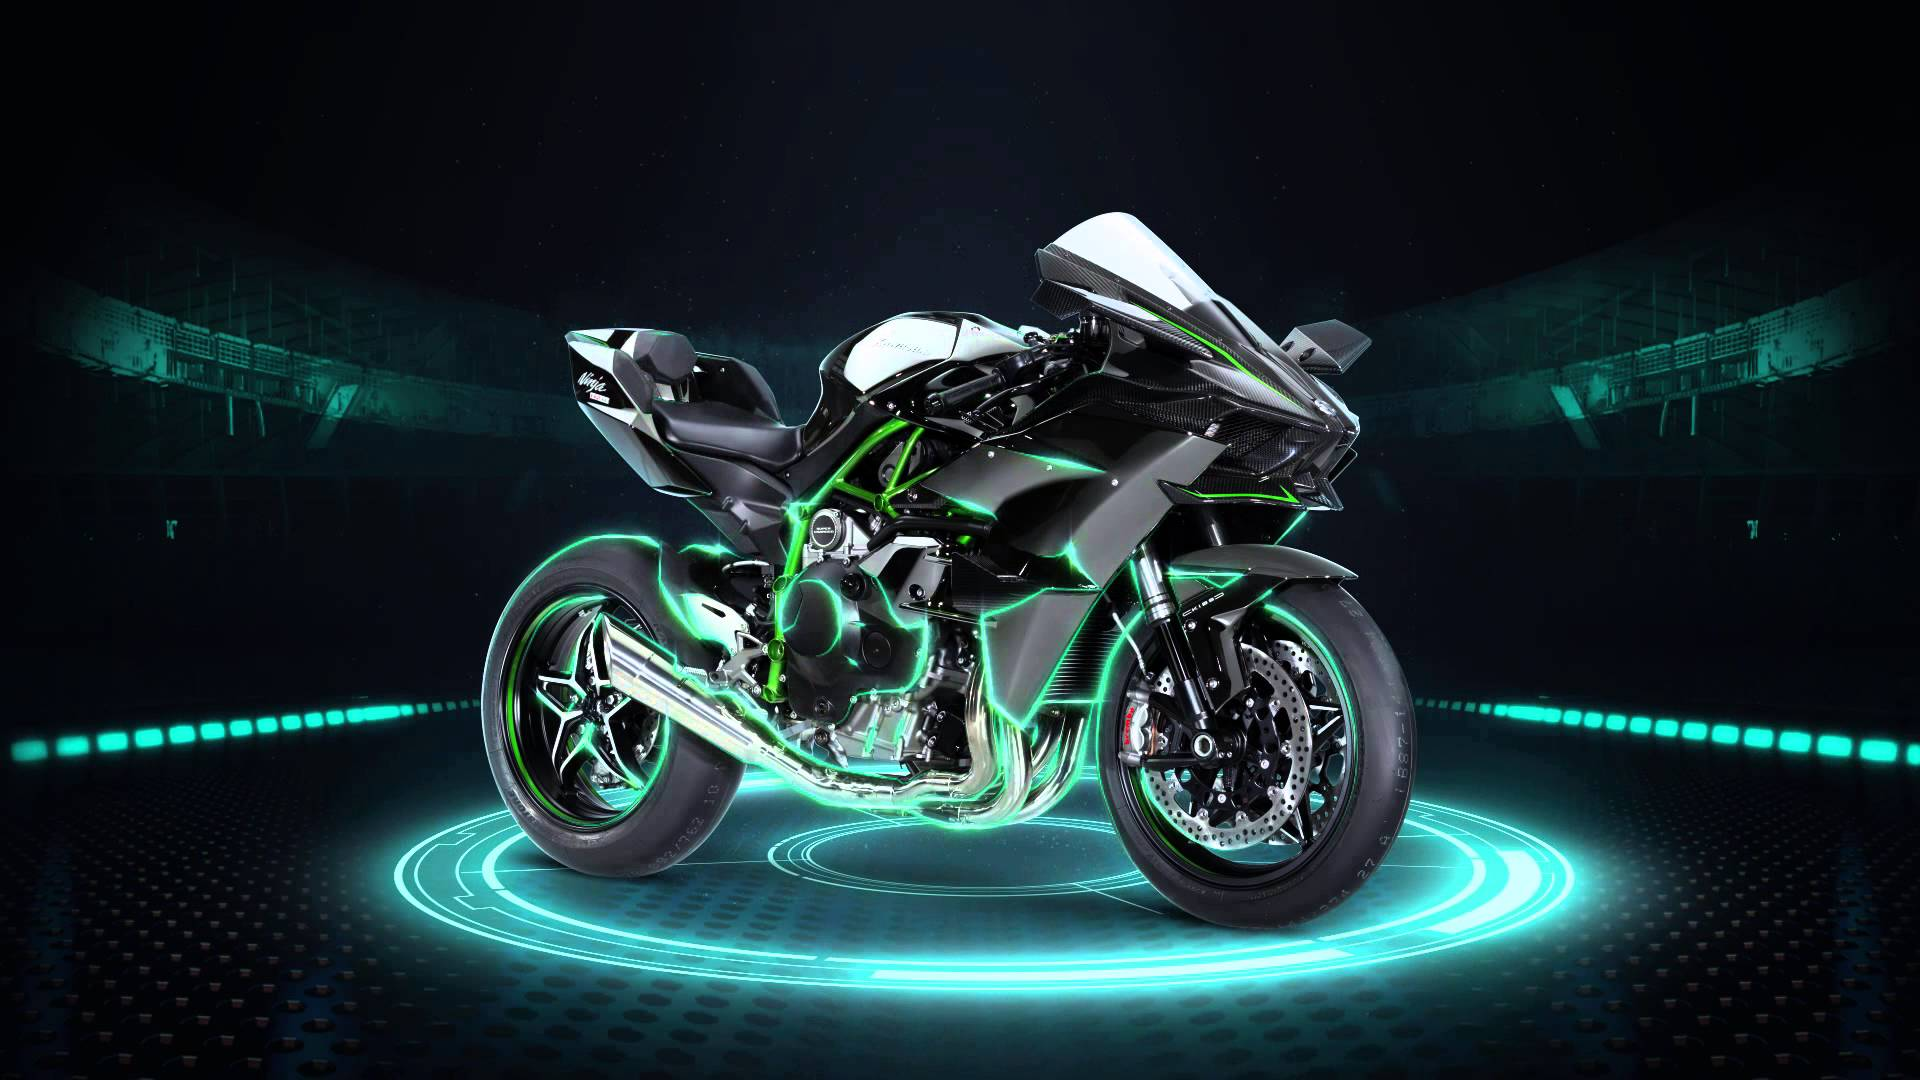 Kawasaki Ninja H2R - Fastest Superbike In The Ninja Series ...